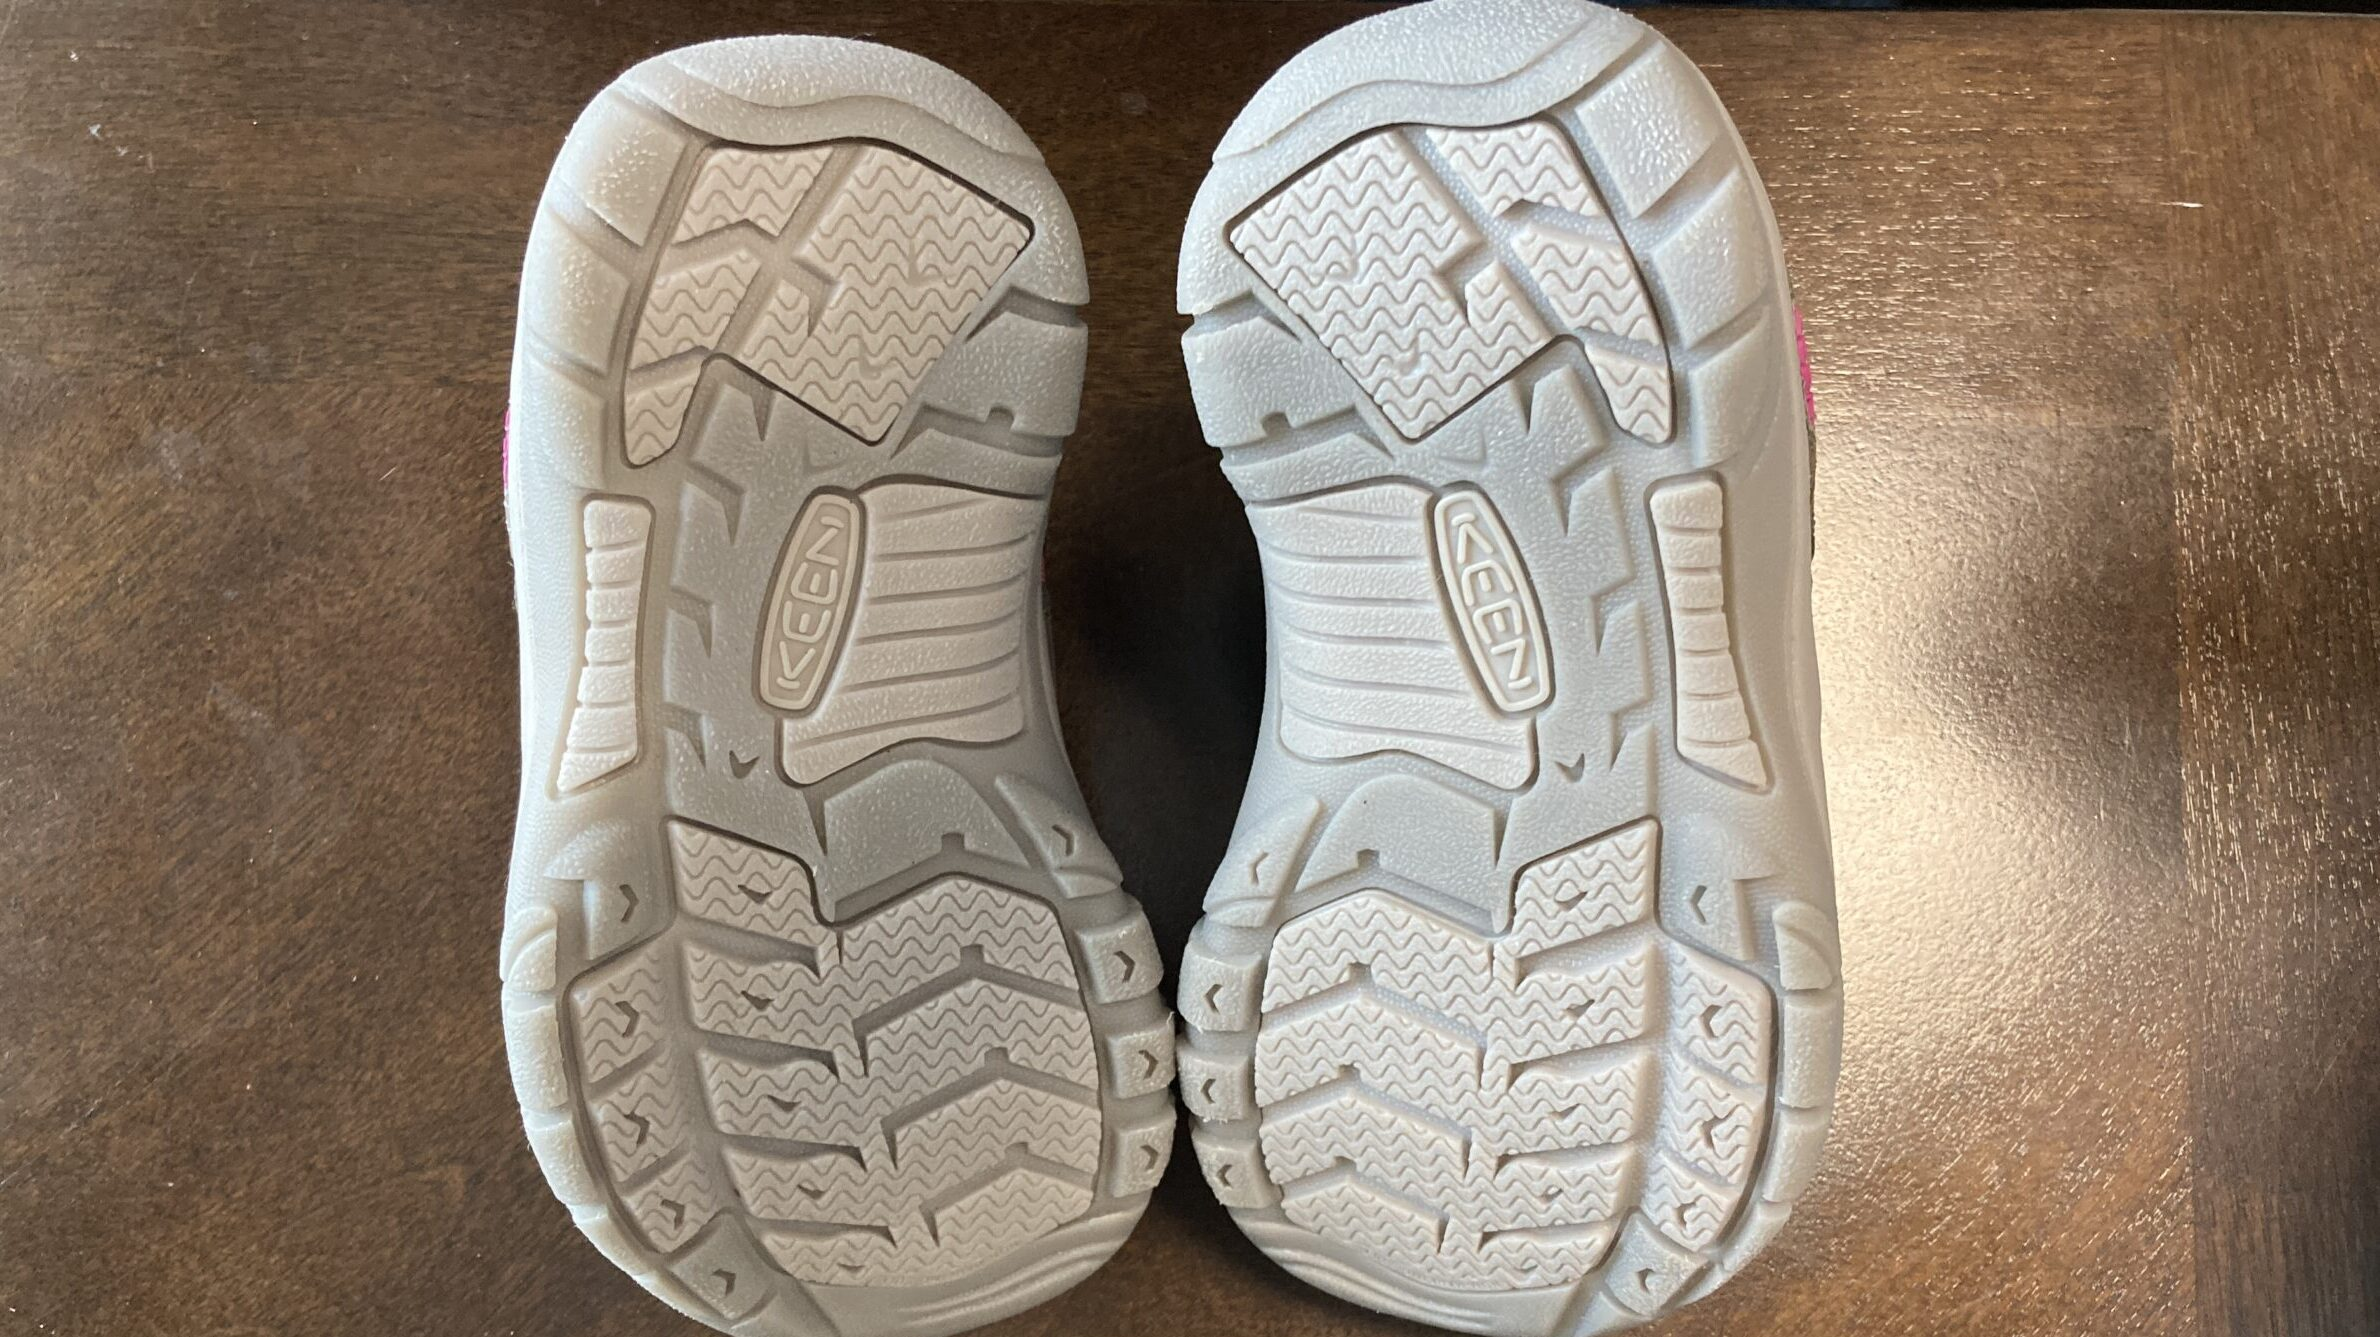 KEEN(キーン)のキッズの靴(スニーカー)ってどう?サイズ感は?防水は?など徹底調査!【ニューポートシューズのレビュー記事】のイメージ画像8